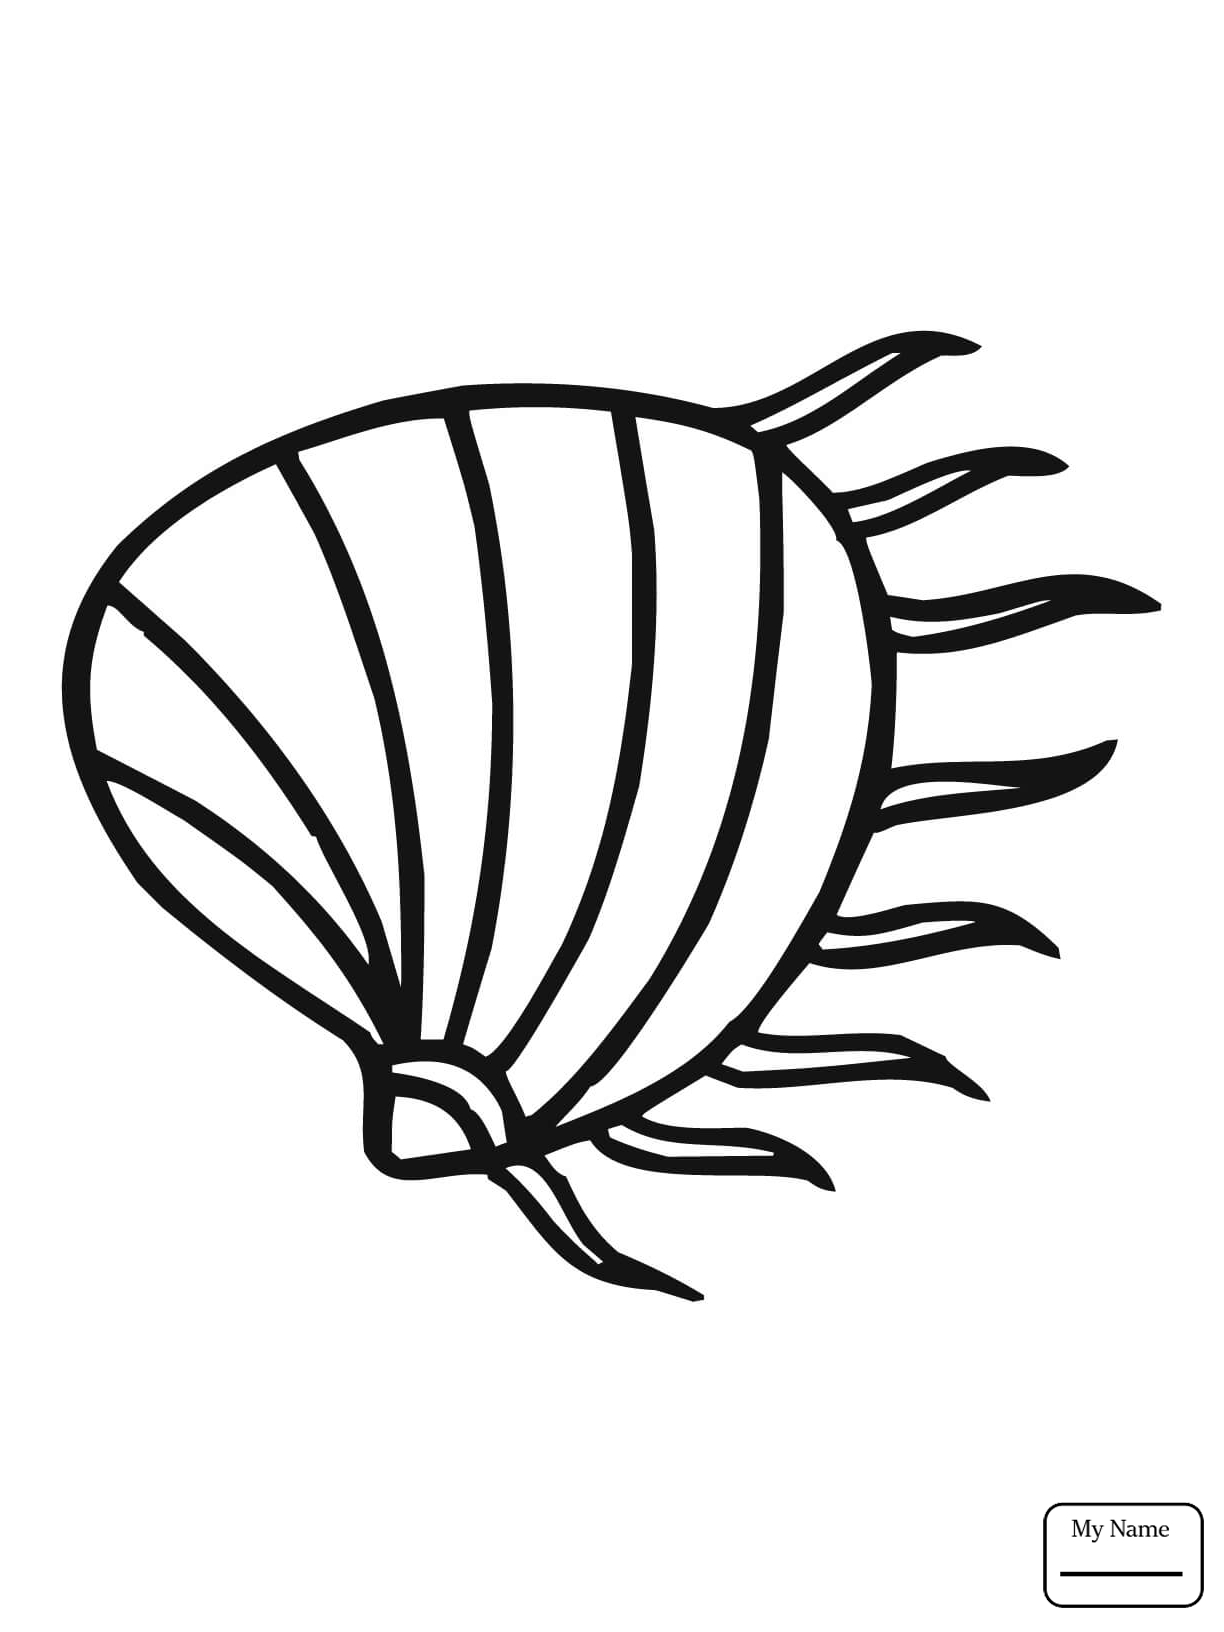 Clam Shell Drawing at GetDrawings